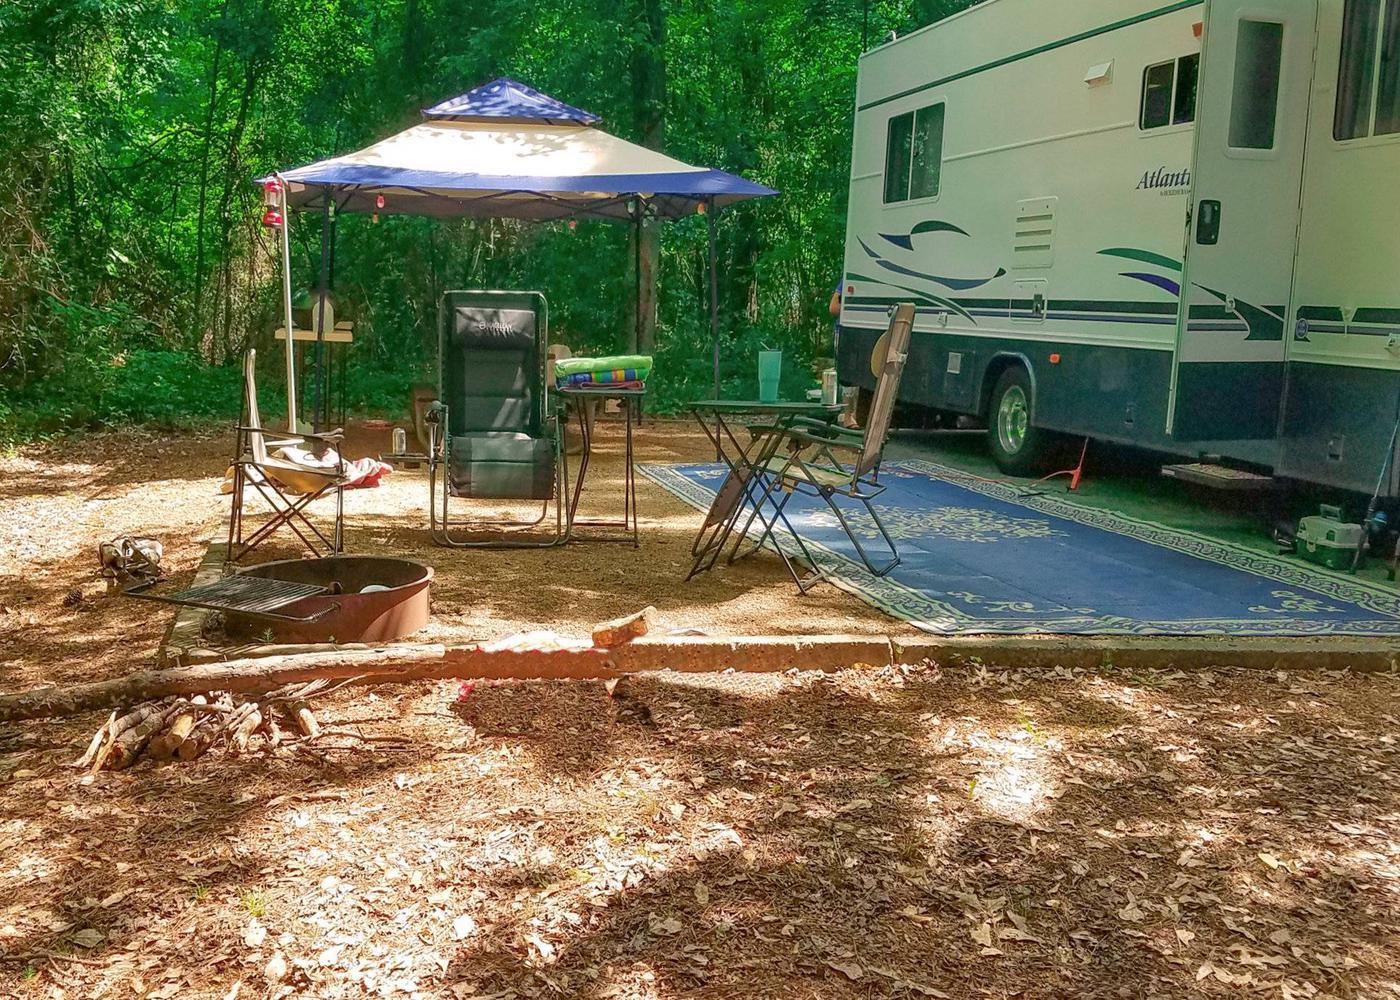 Campsite view.Victoria Campground, campsite 30.